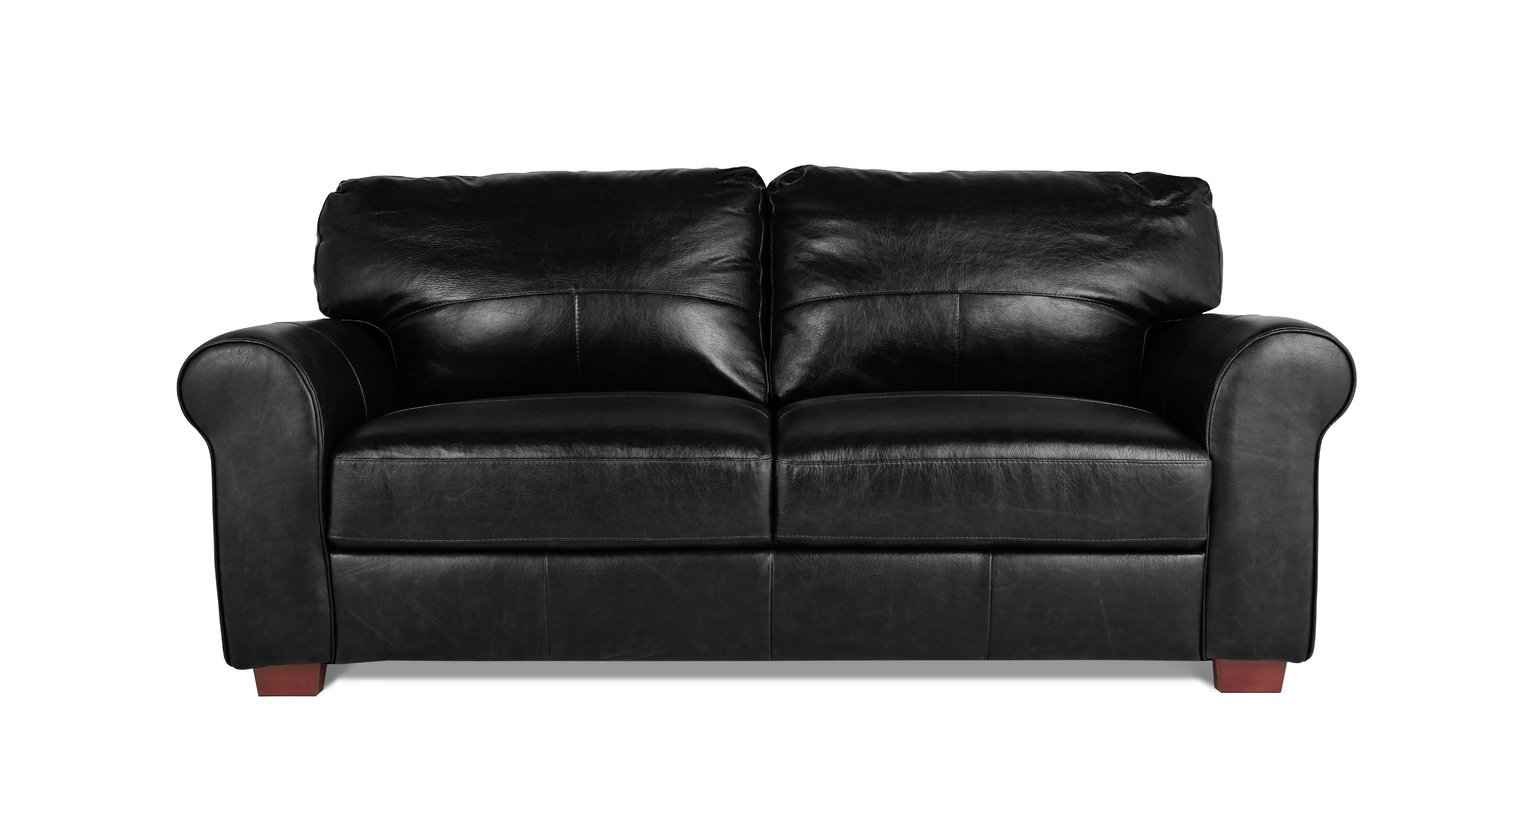 Habitat Salisbury 3 Seater Leather Sofa - Black